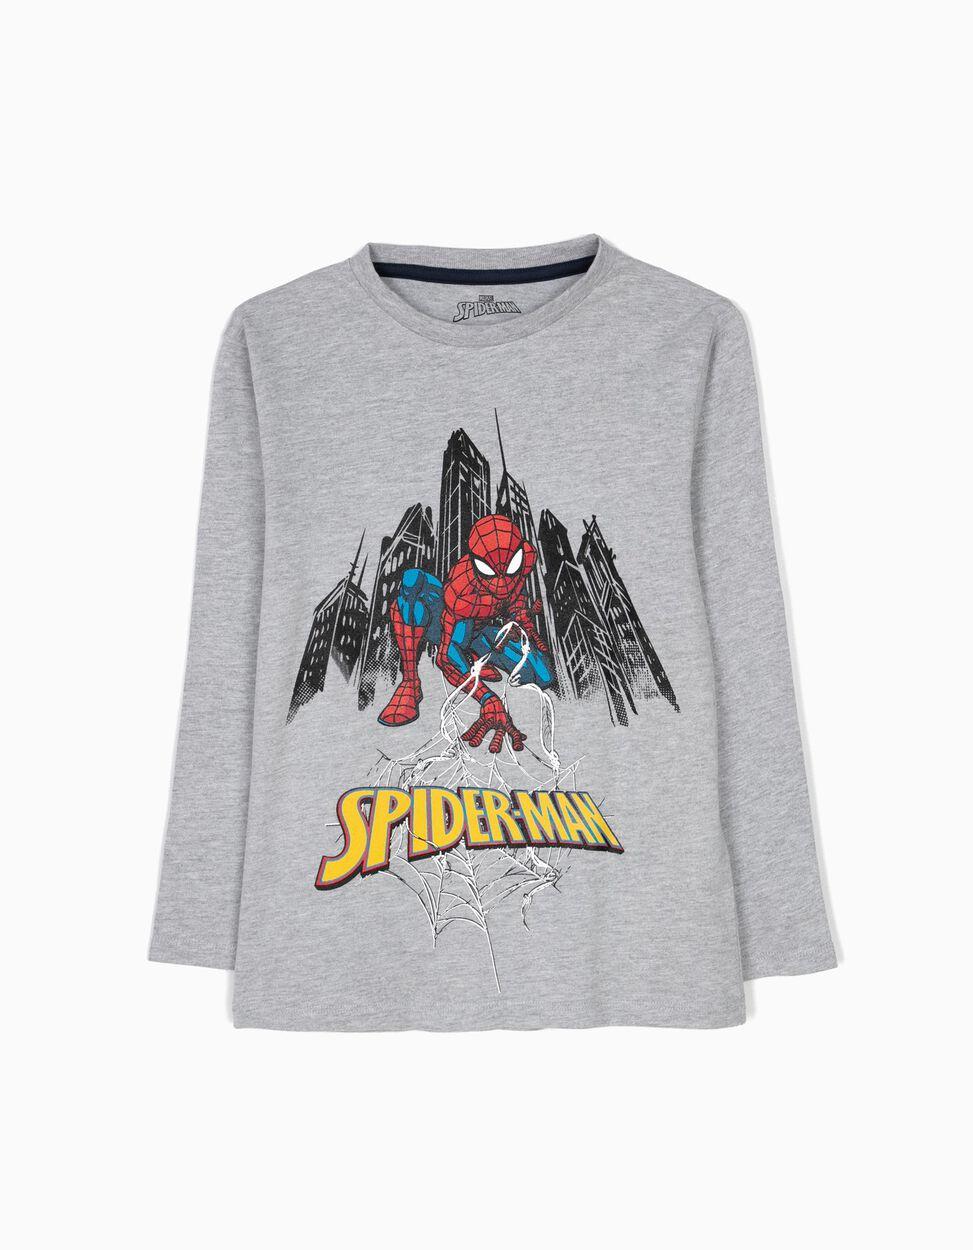 Producto oficial, camiseta manga larga Spiderman